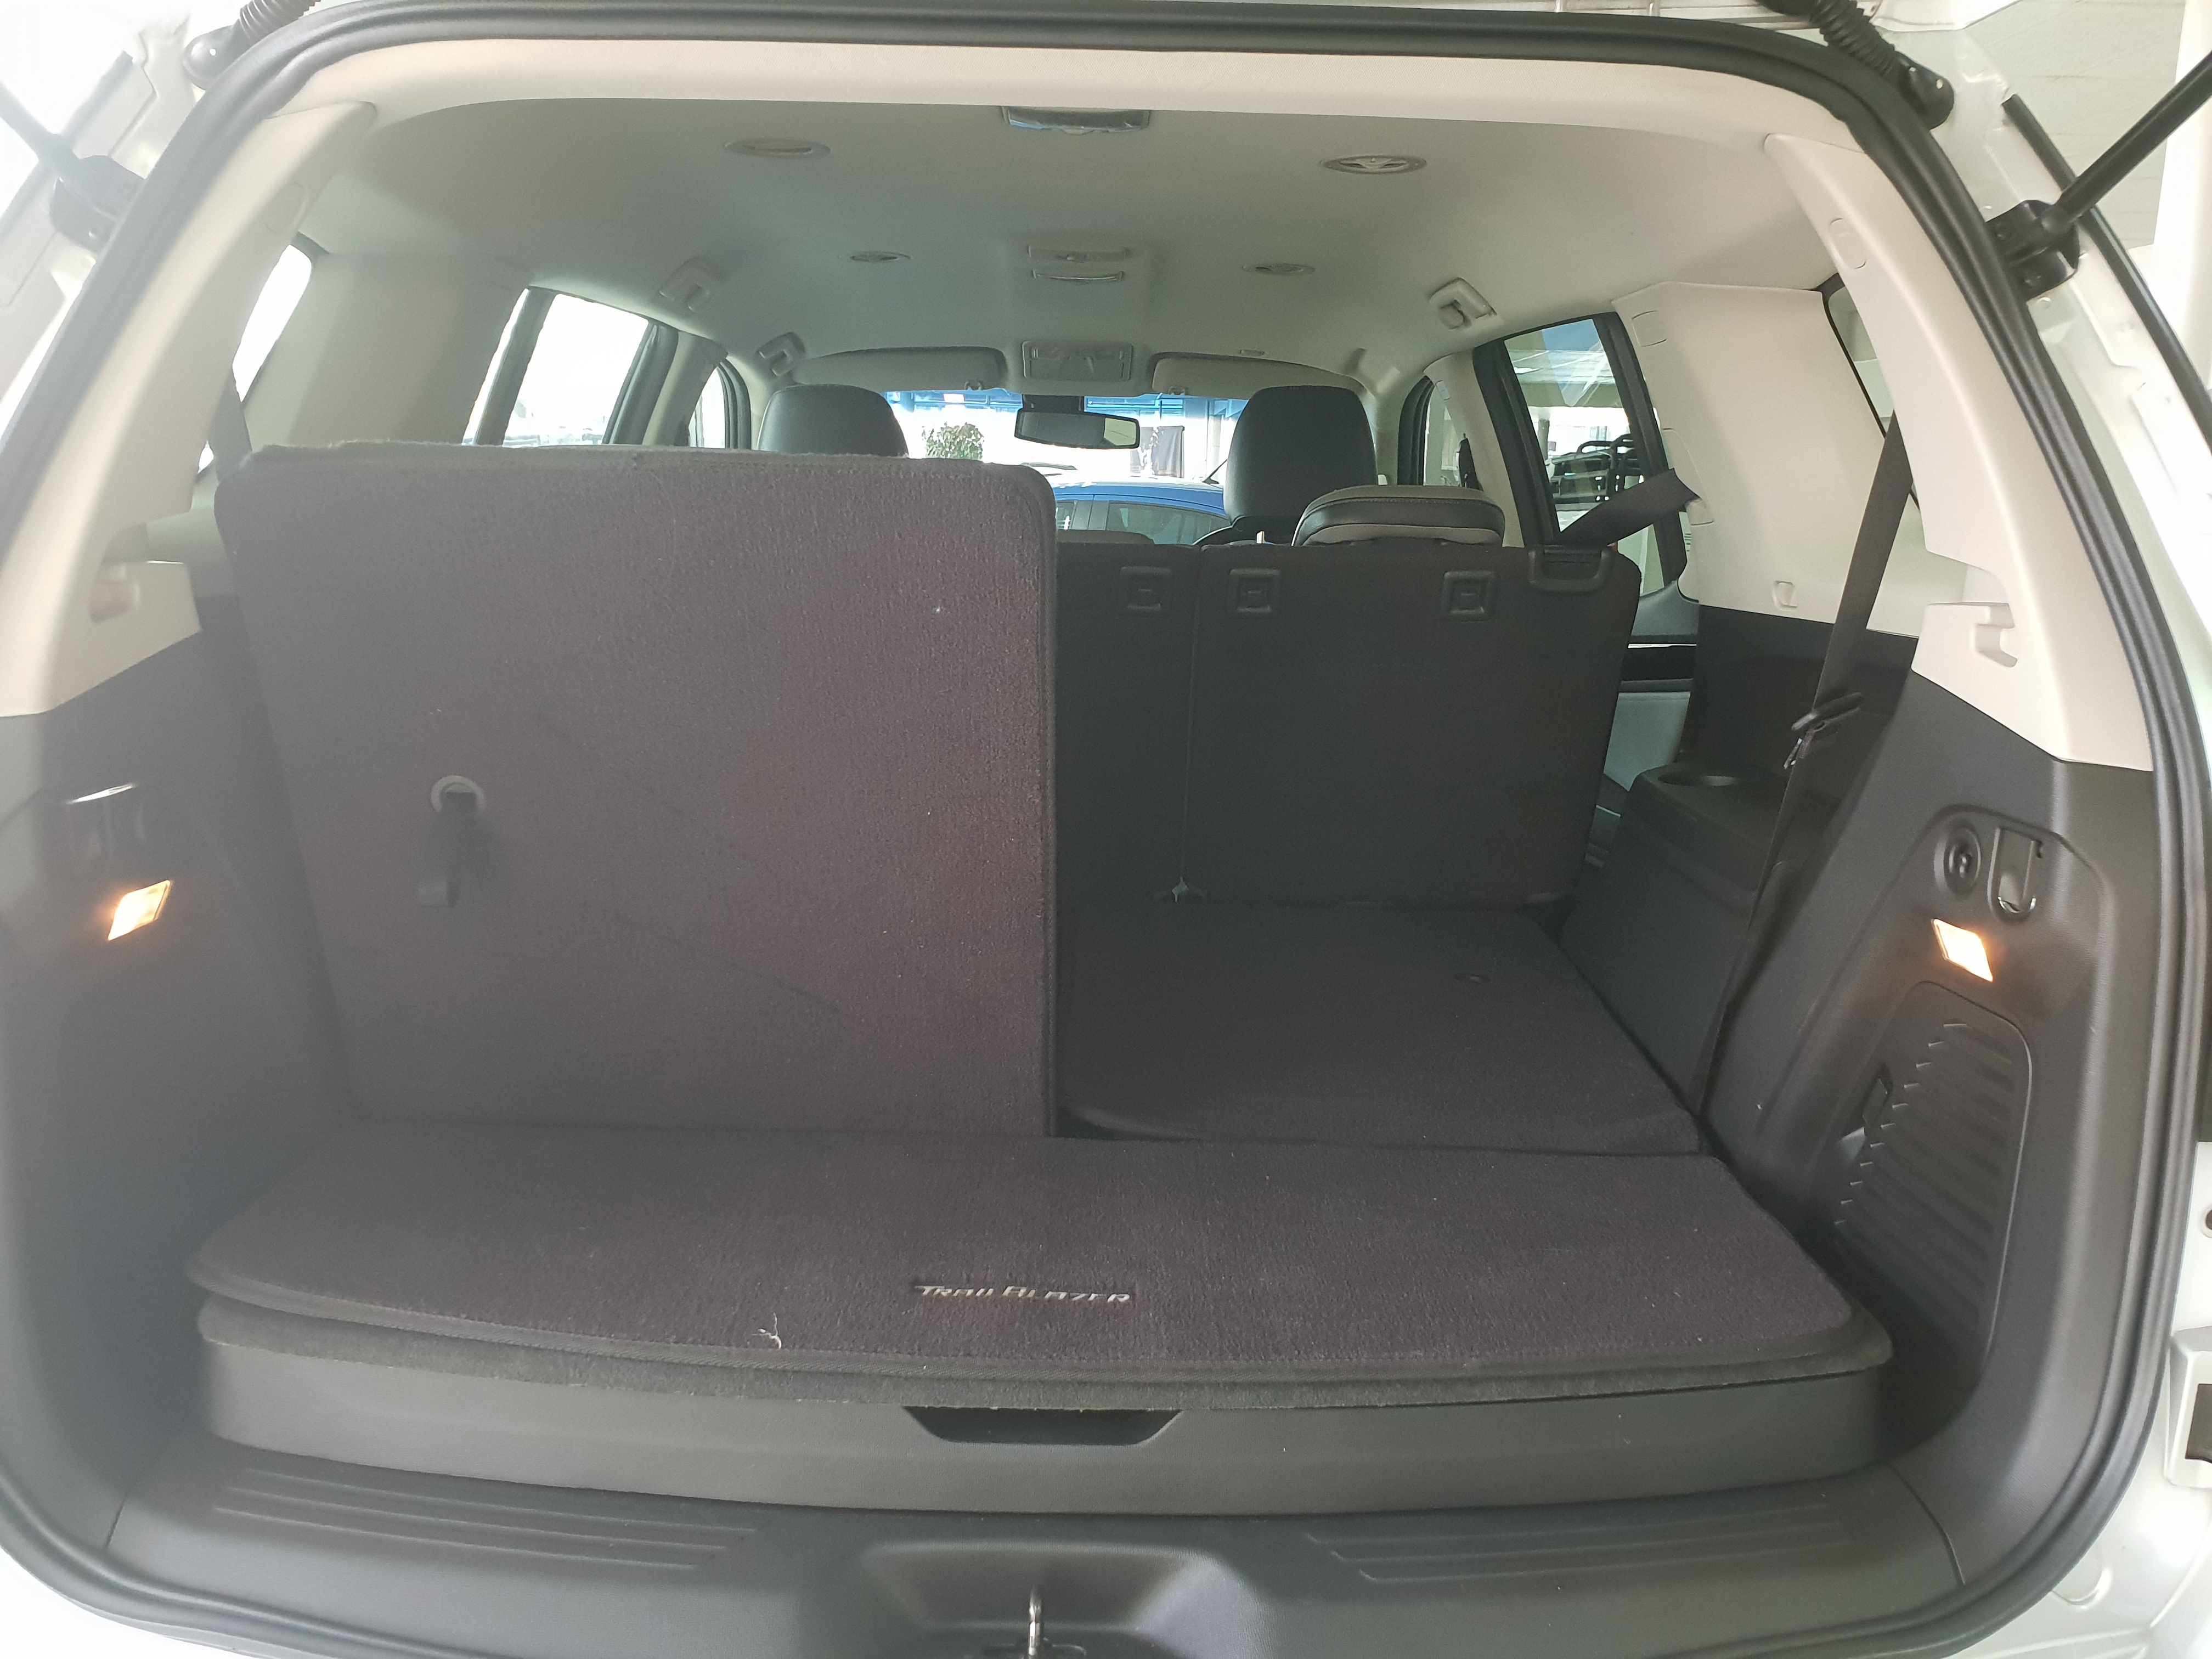 Chevrolet Trailblazer 2.8 Ltz A/t